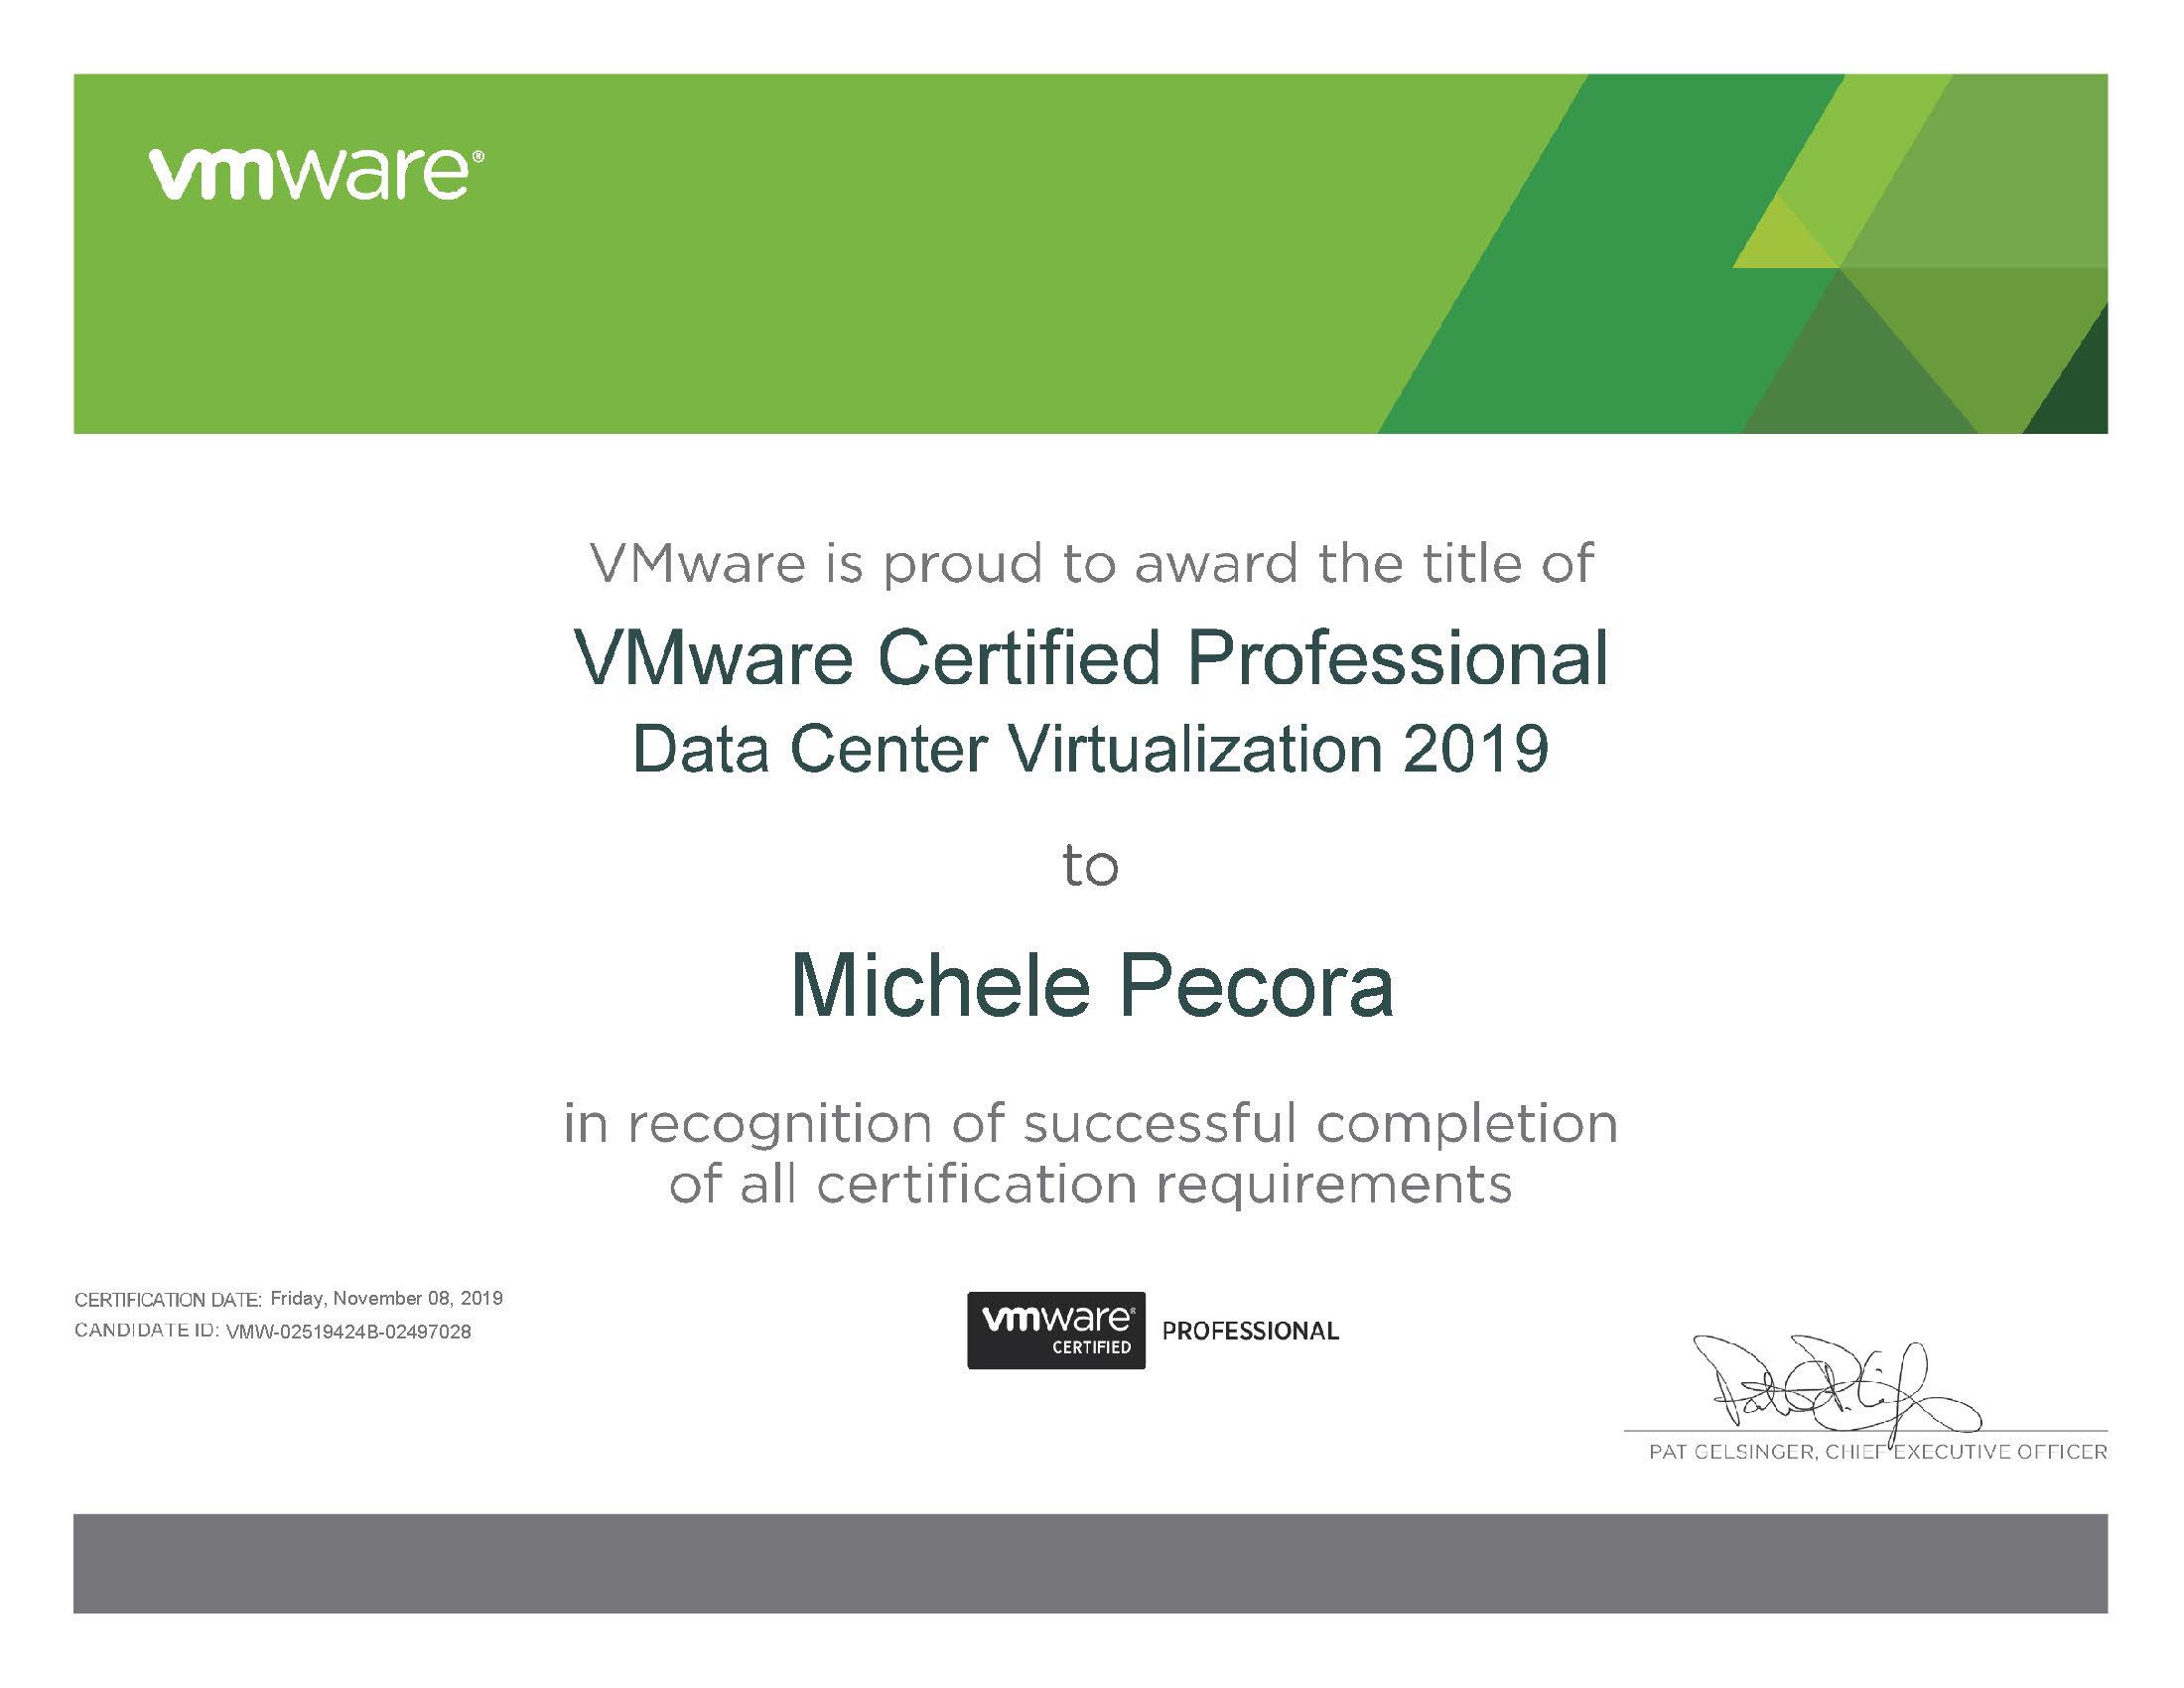 Michele Pecora | VMware Certified Professional - Data Center Virtualization 2019 certificate (1)